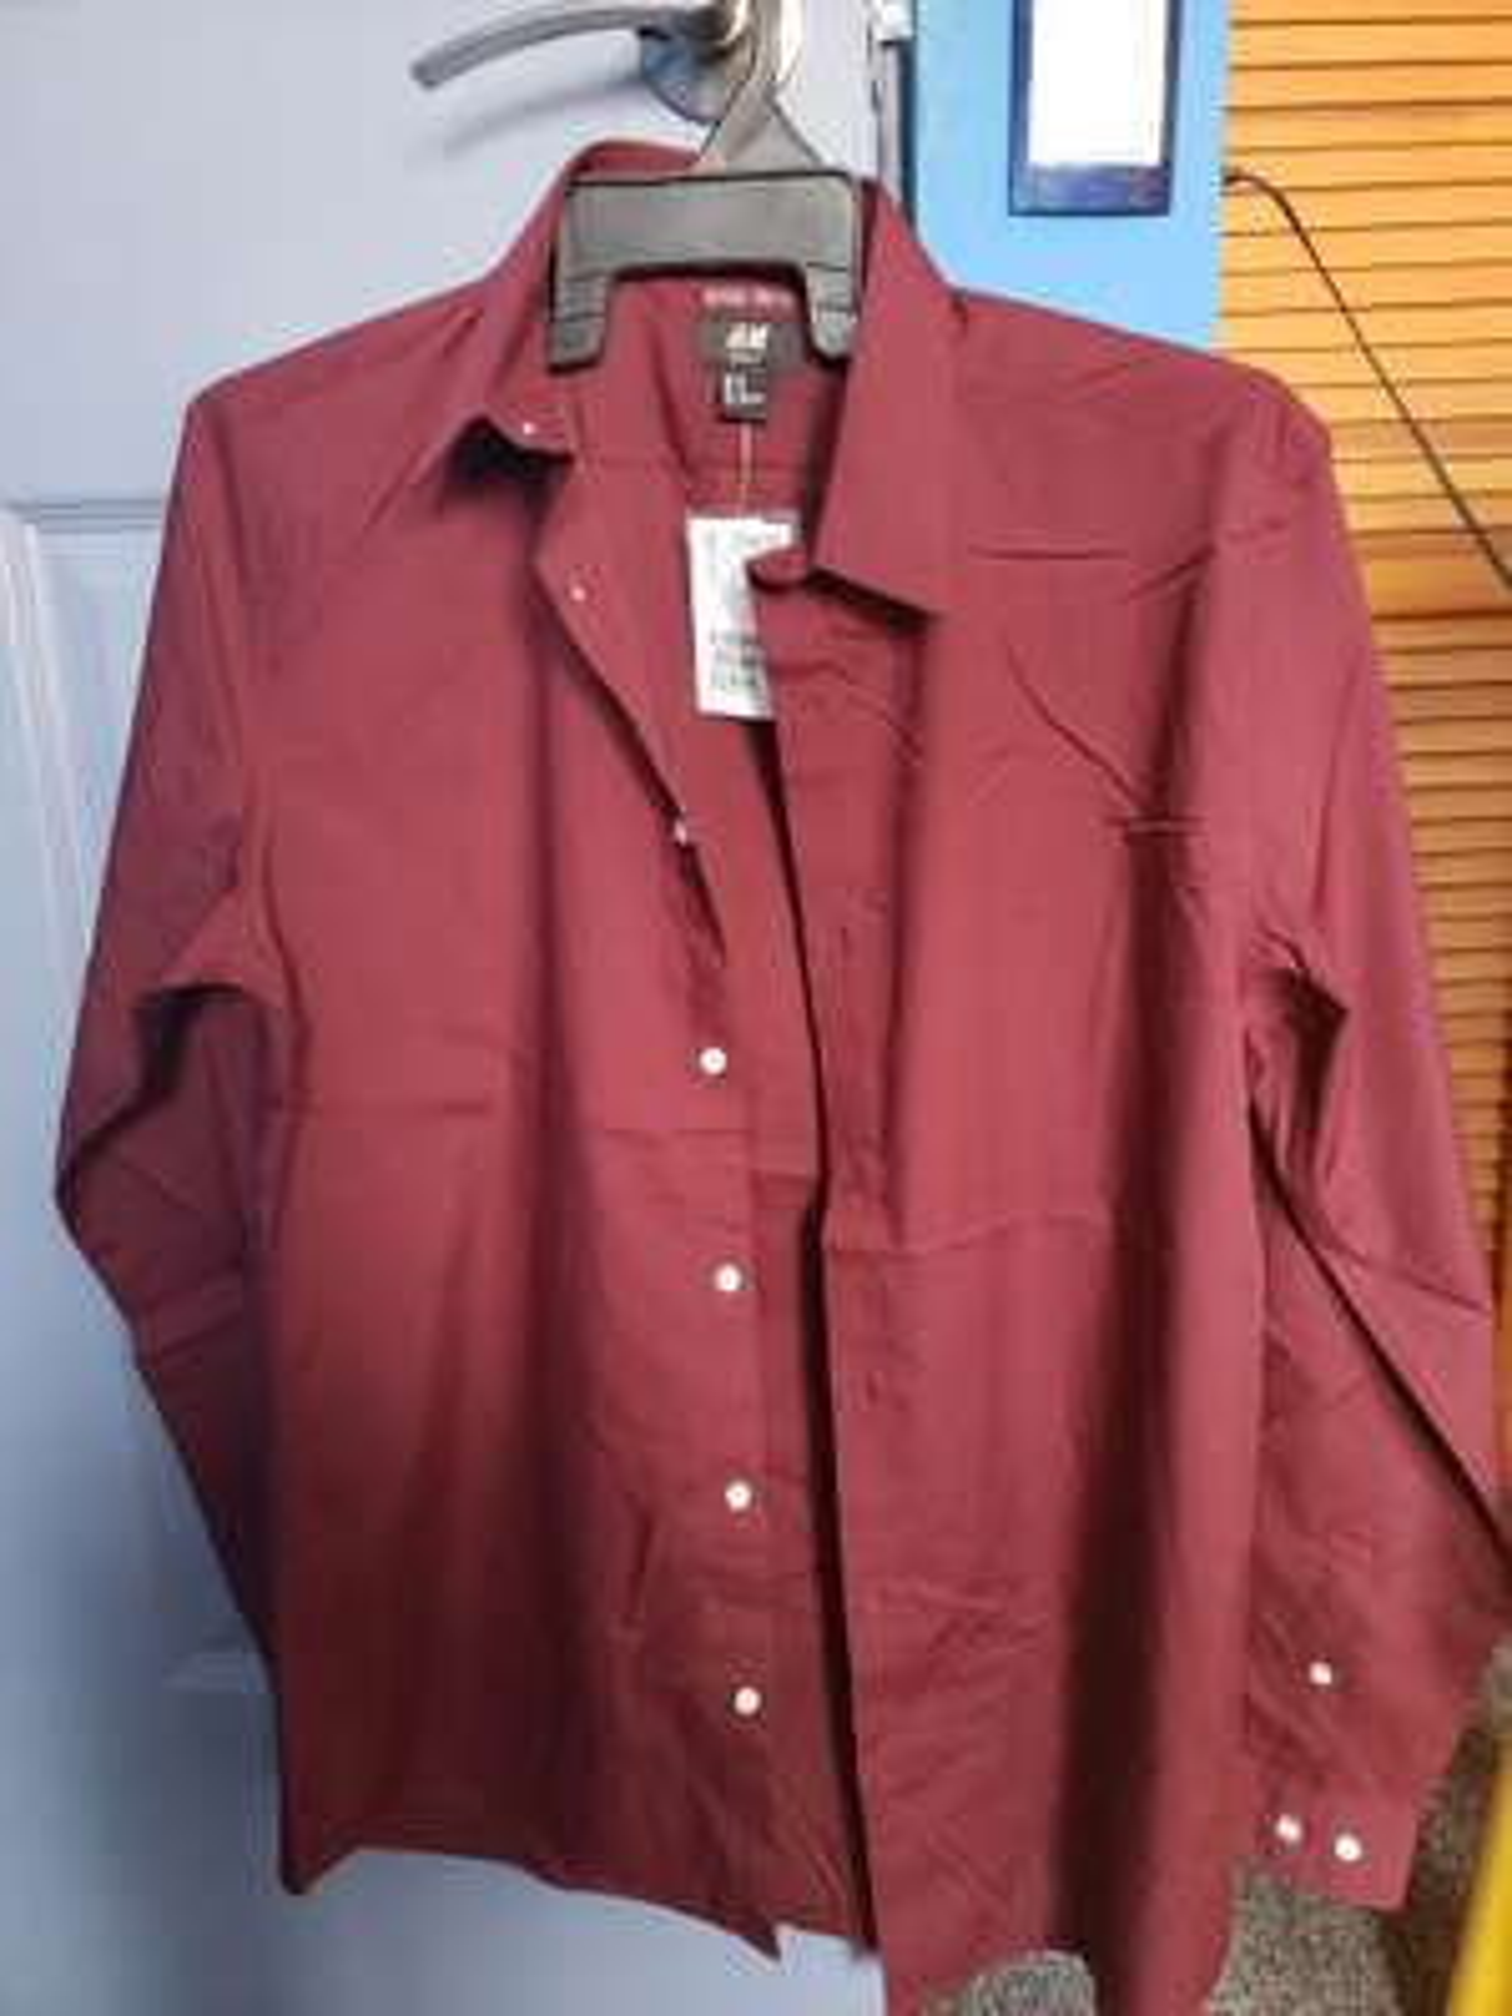 H&M: Camisa $99.5